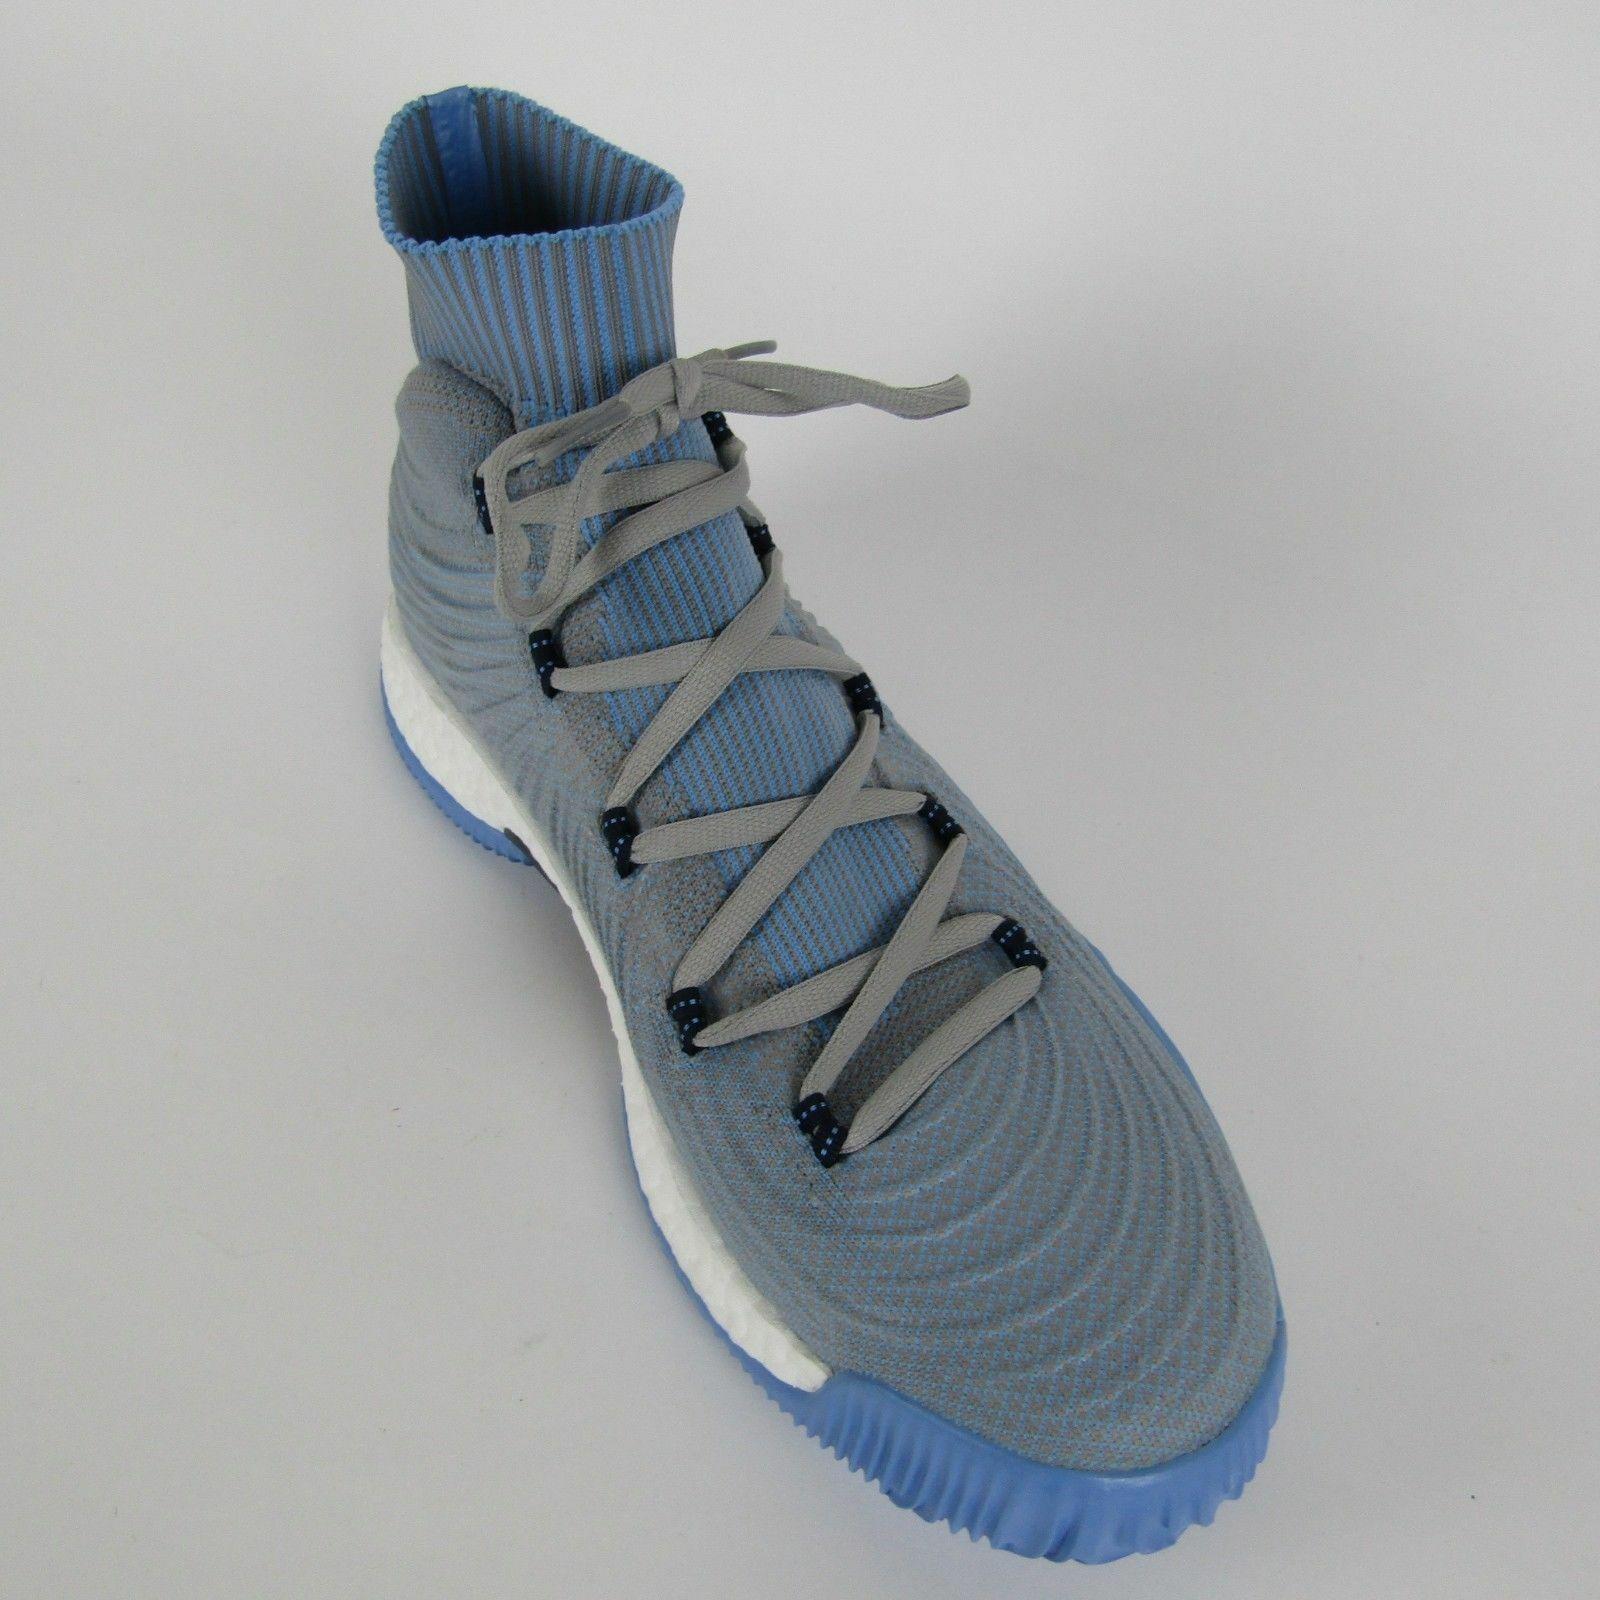 Adidas Crazy Esplosiva Primeknit Kenneth Sonia Ferrari Pe Pepite Nets AC8724 image 3